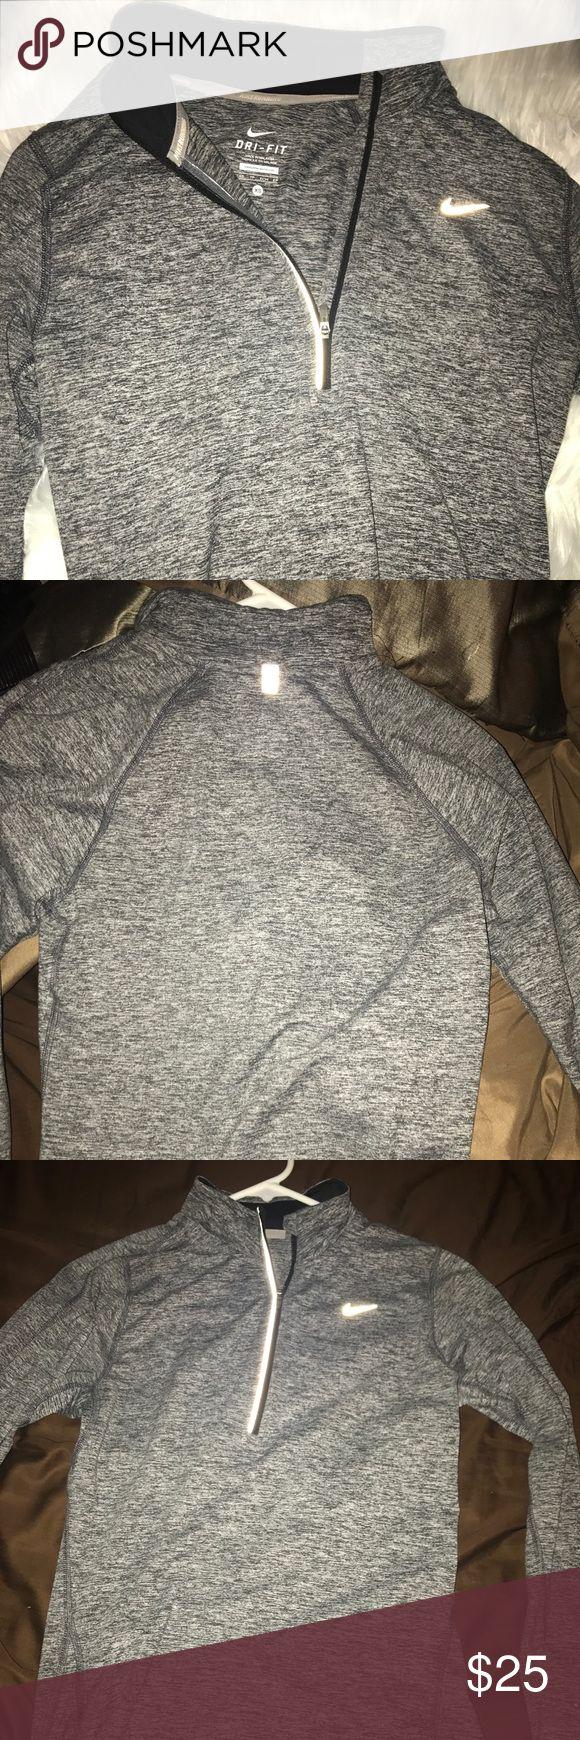 Long Sleeve Nike 3/4 Zip Sweater 3/4 zip sweater from Nike running. Great condition. Multi-colored grey color. Nike Tops Sweatshirts & Hoodies